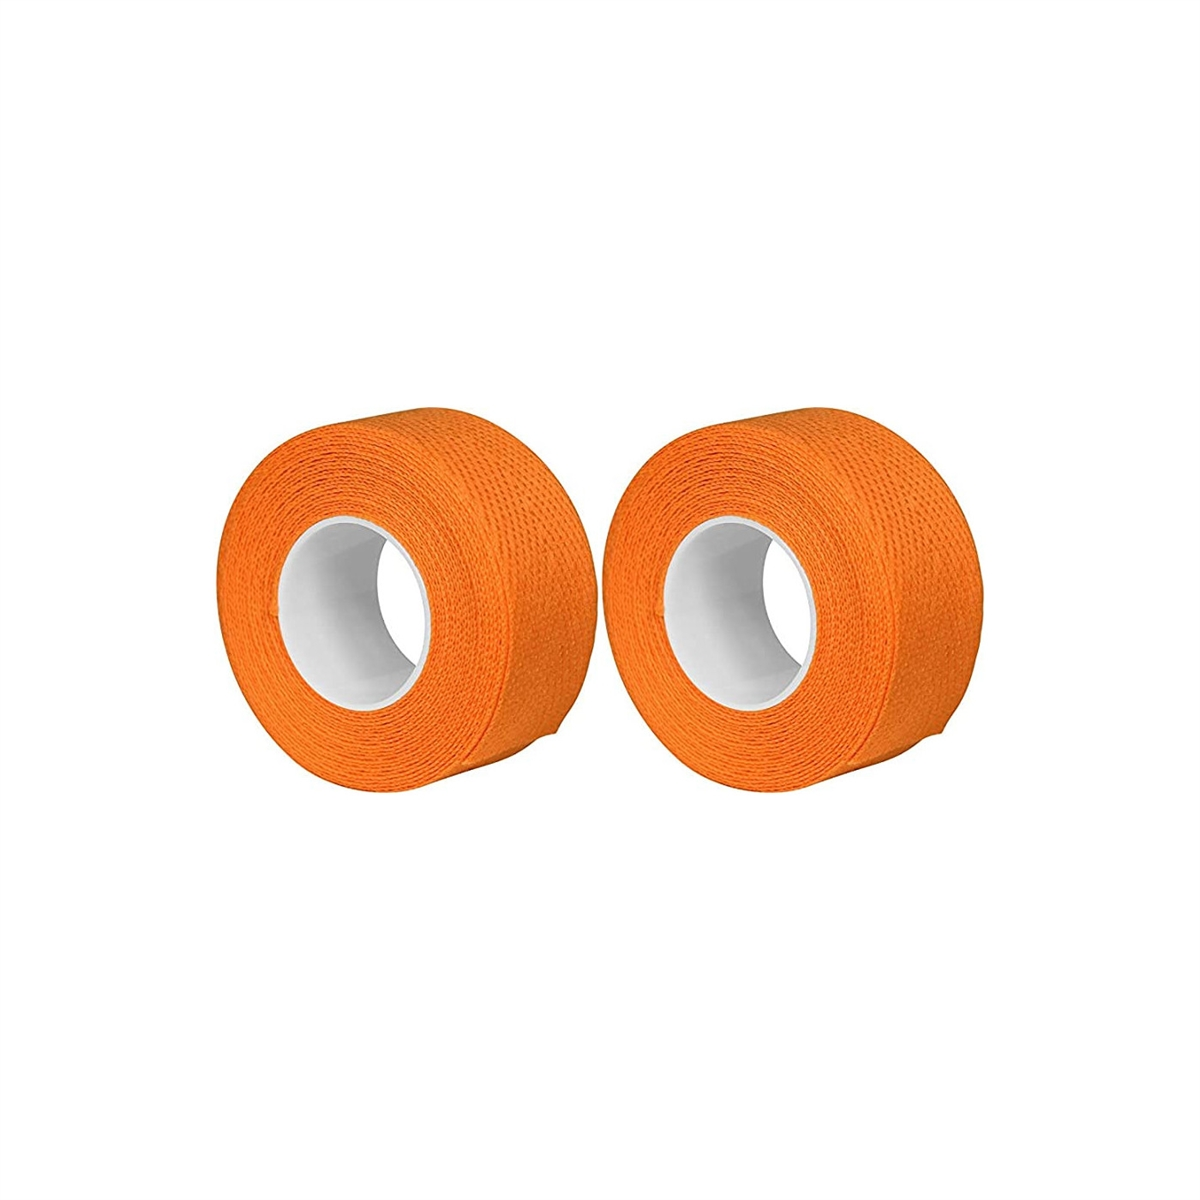 Pair cotton vintage retrò handlebar tape orange